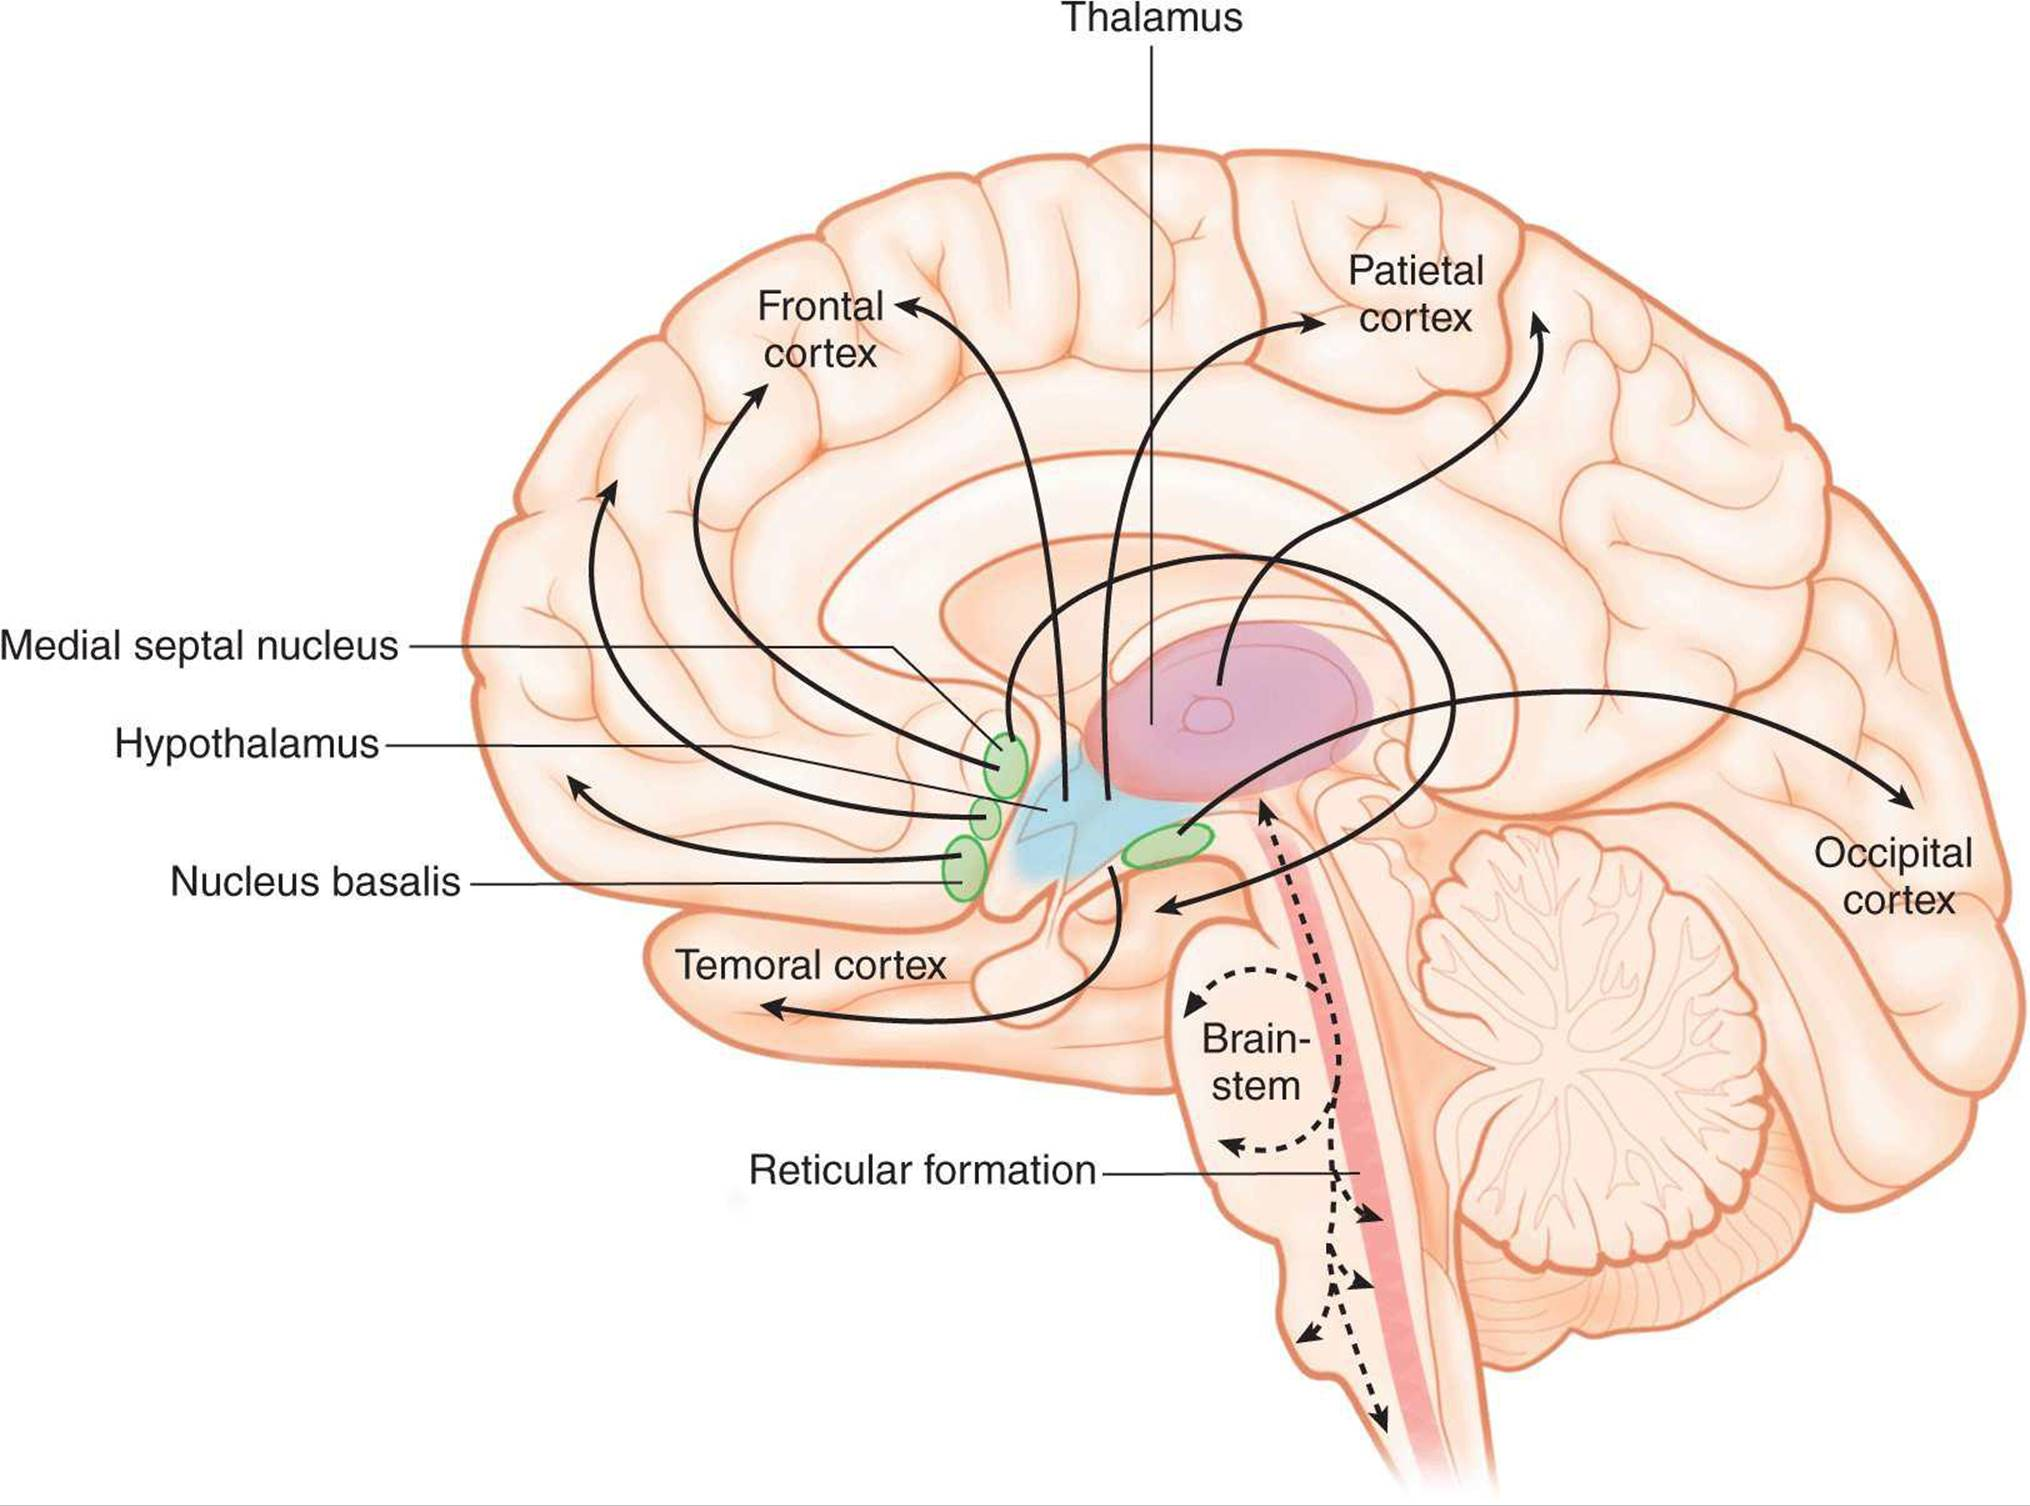 Electrical Activity Of The Brain Sleep Wake States Circadian